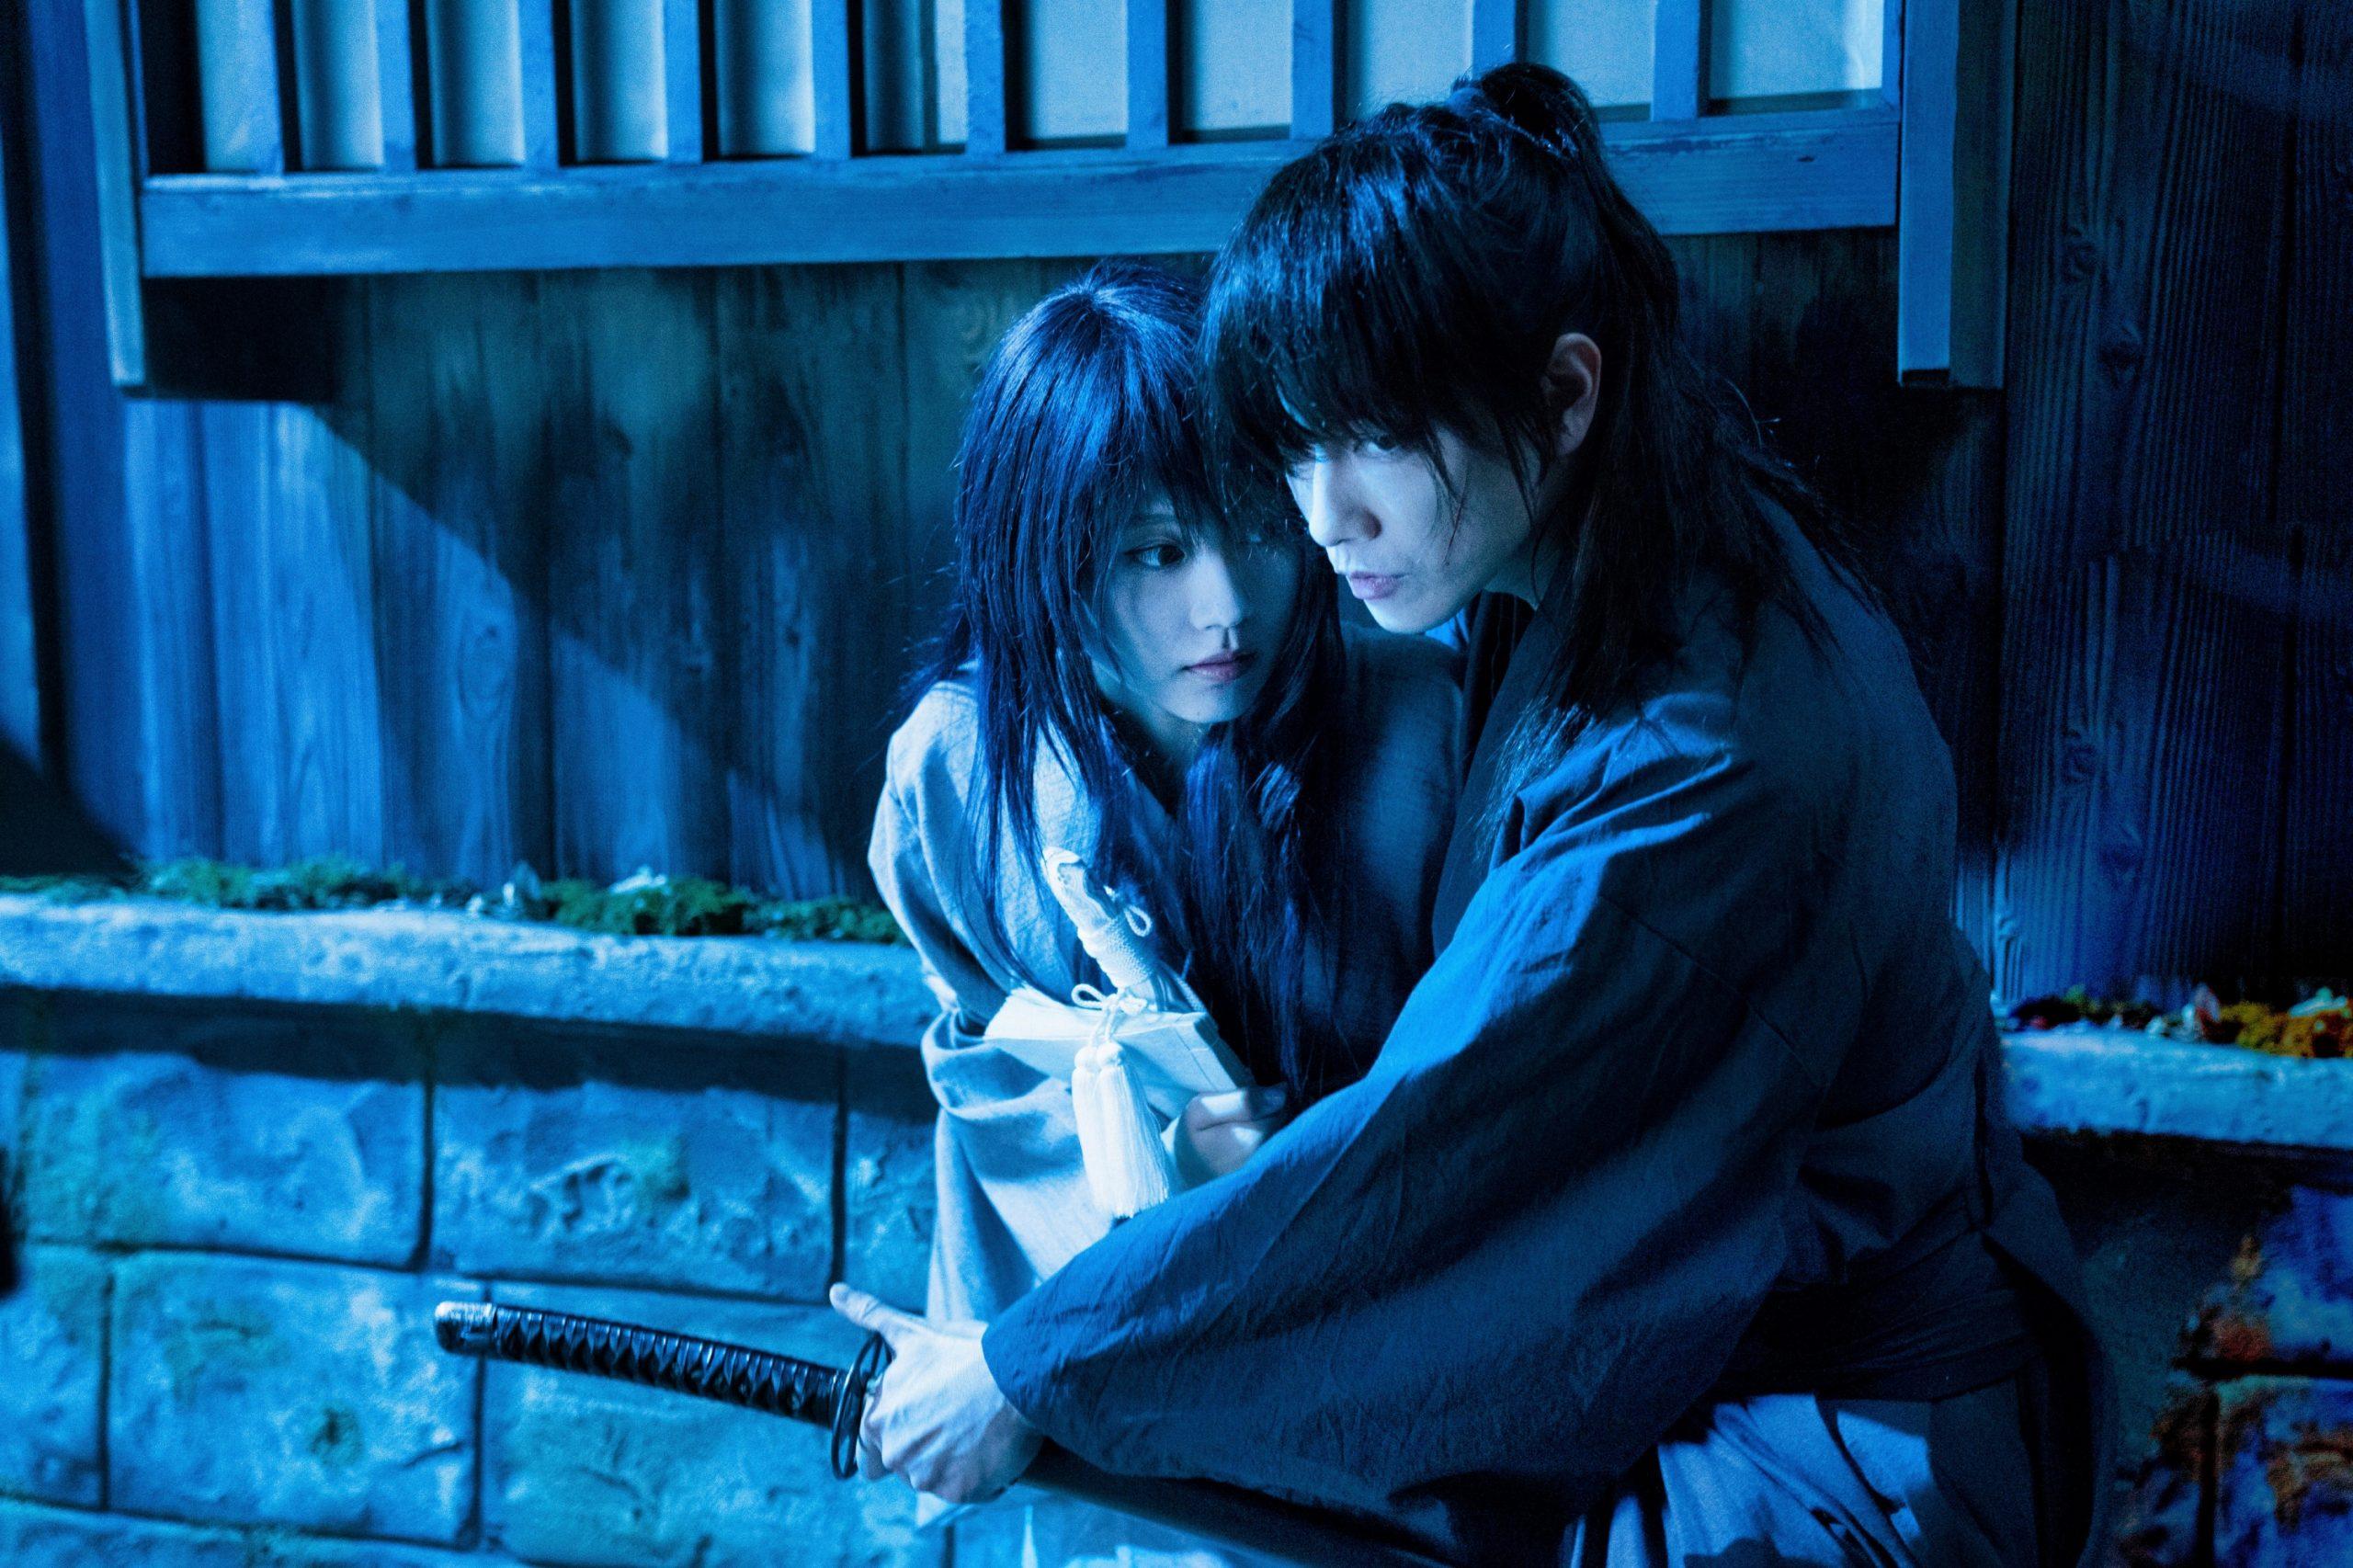 Featured image for Rurouni Kenshin: The Beginning (2021) by Keishi Otomo